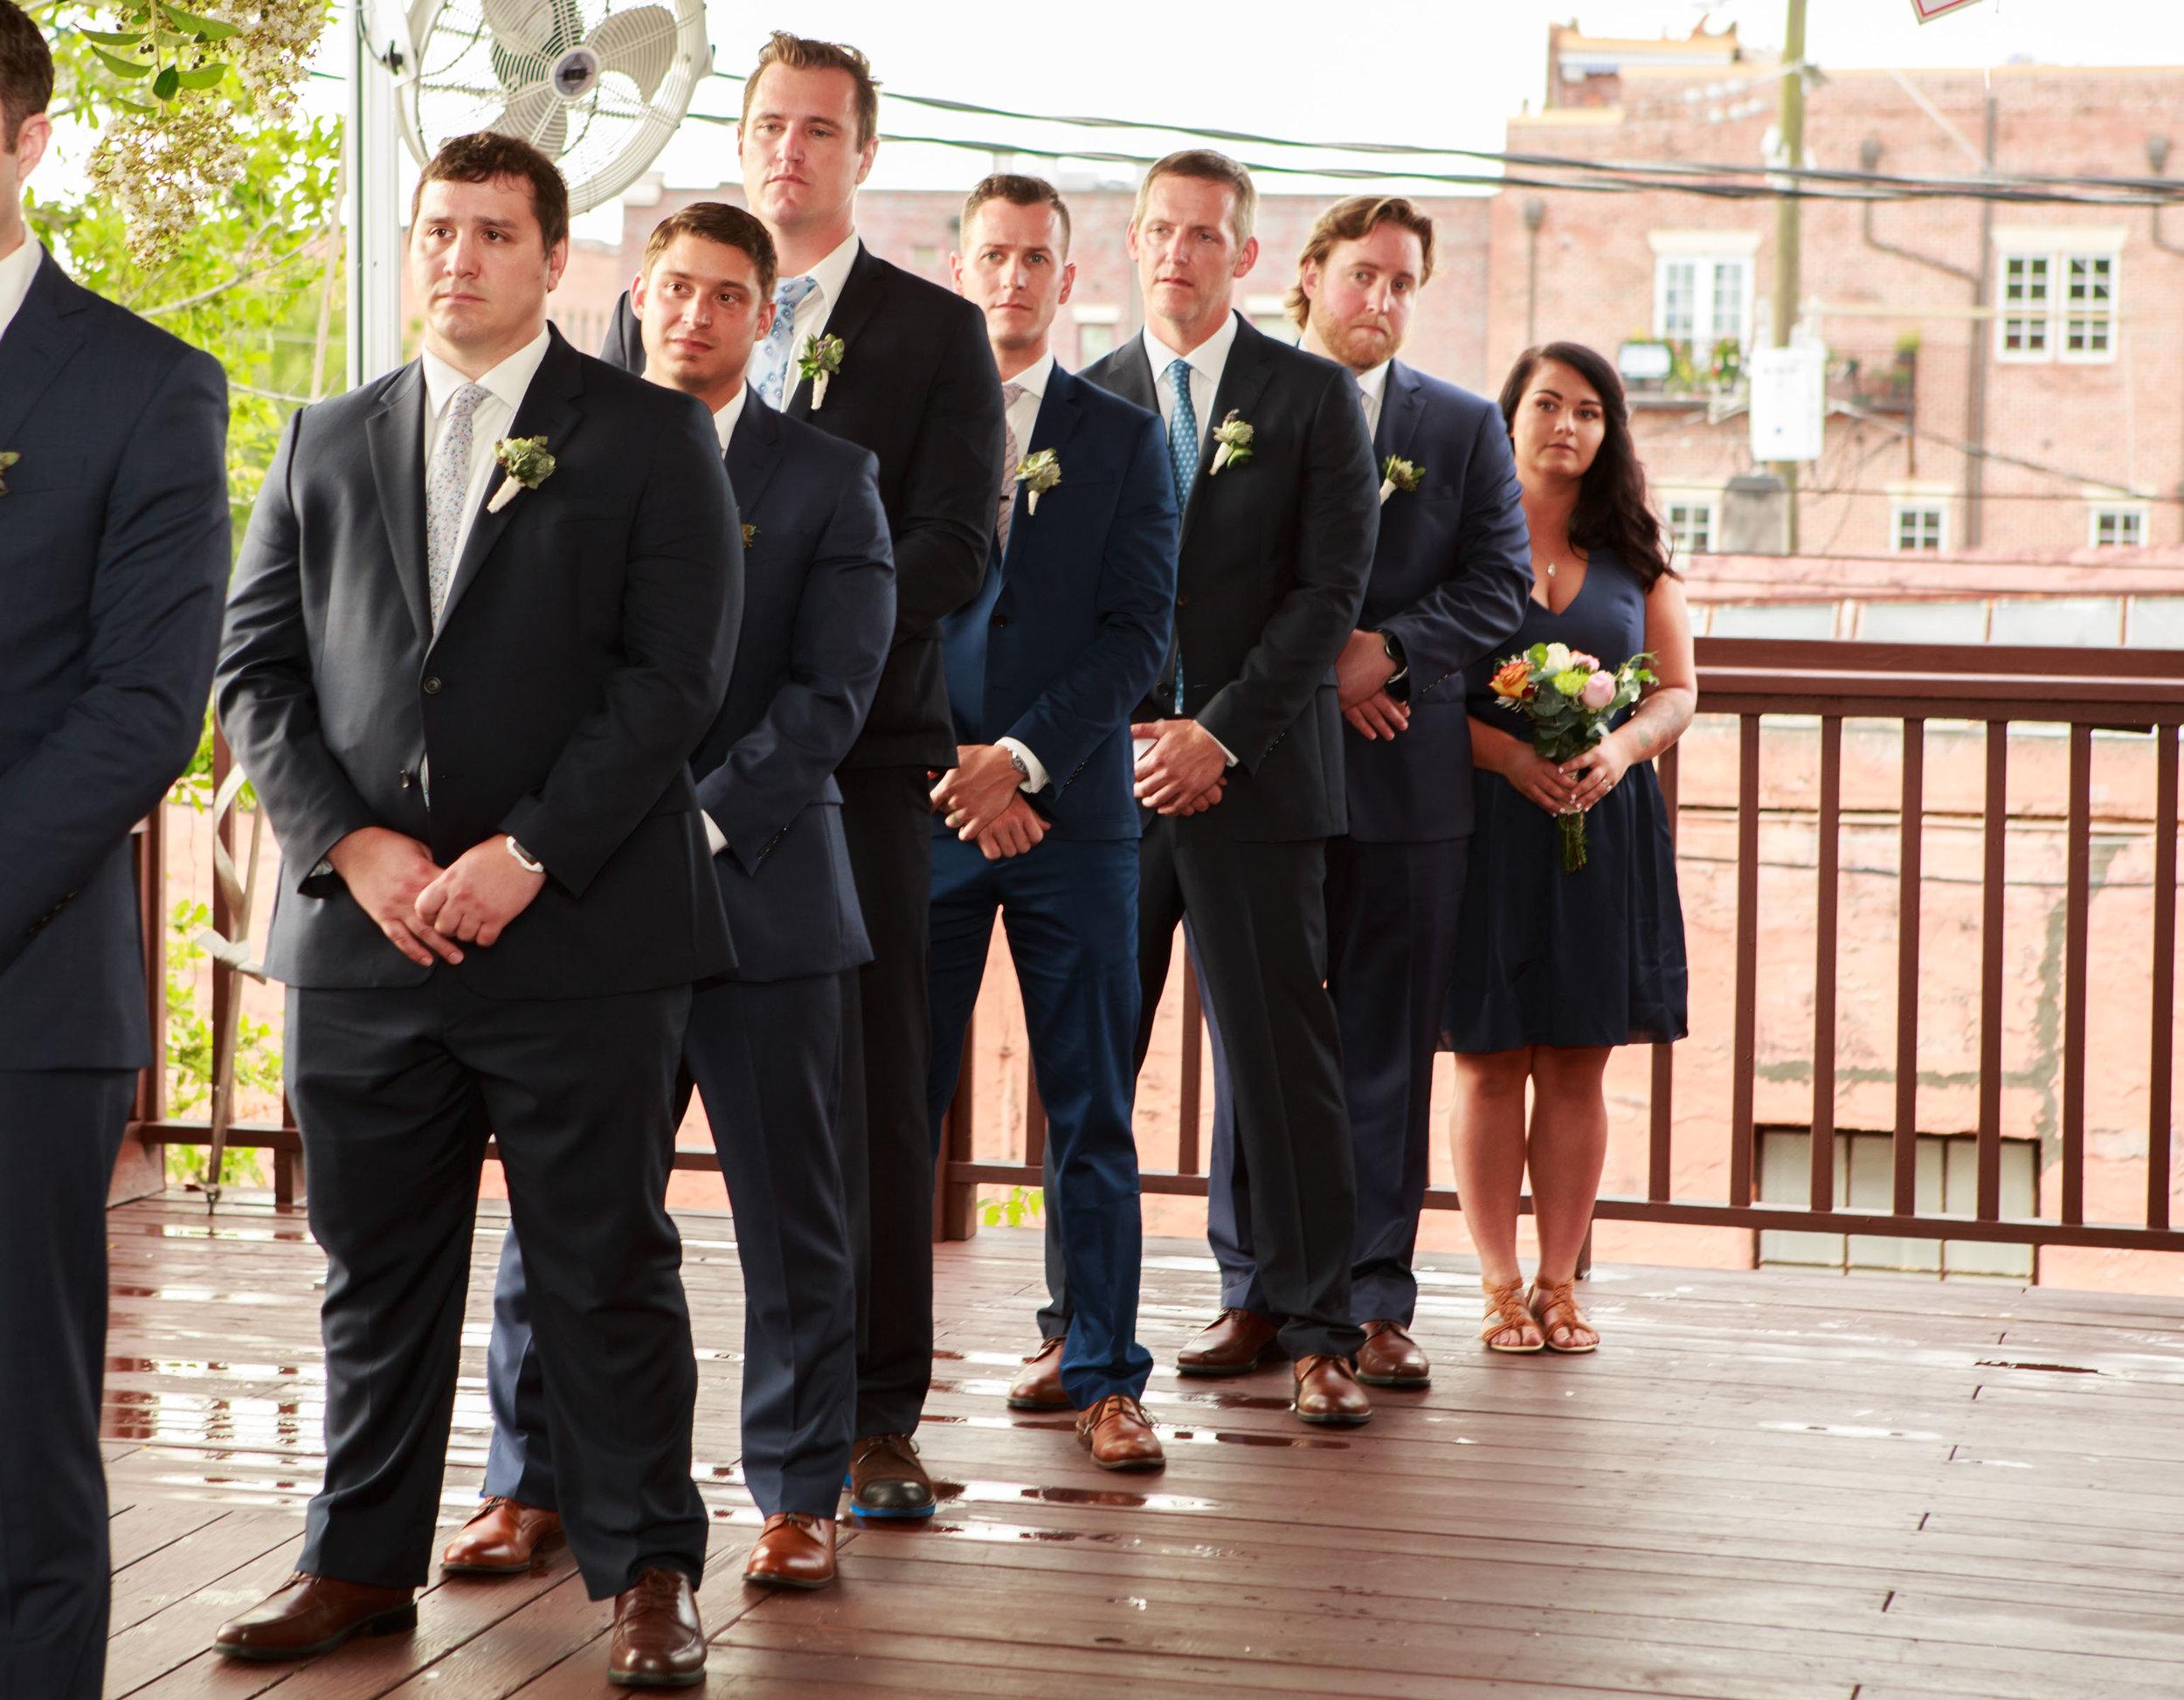 128-South-Wedding-Wilmington-NC-Photographer-Ceremony-16.3.jpg